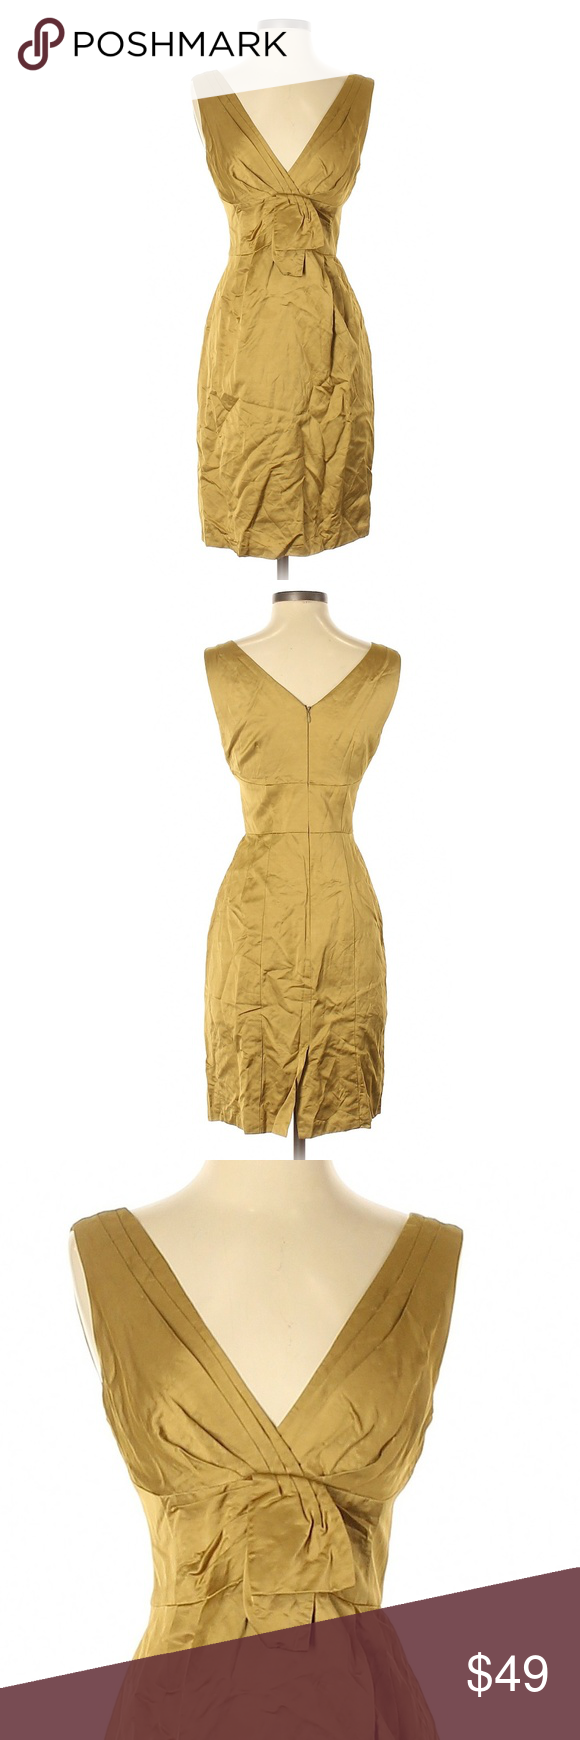 Nanette Lepore Greenish Golden Tan Cocktail Dress Nanette Lepore Dress Clothes Design Womens Dresses [ 1740 x 580 Pixel ]